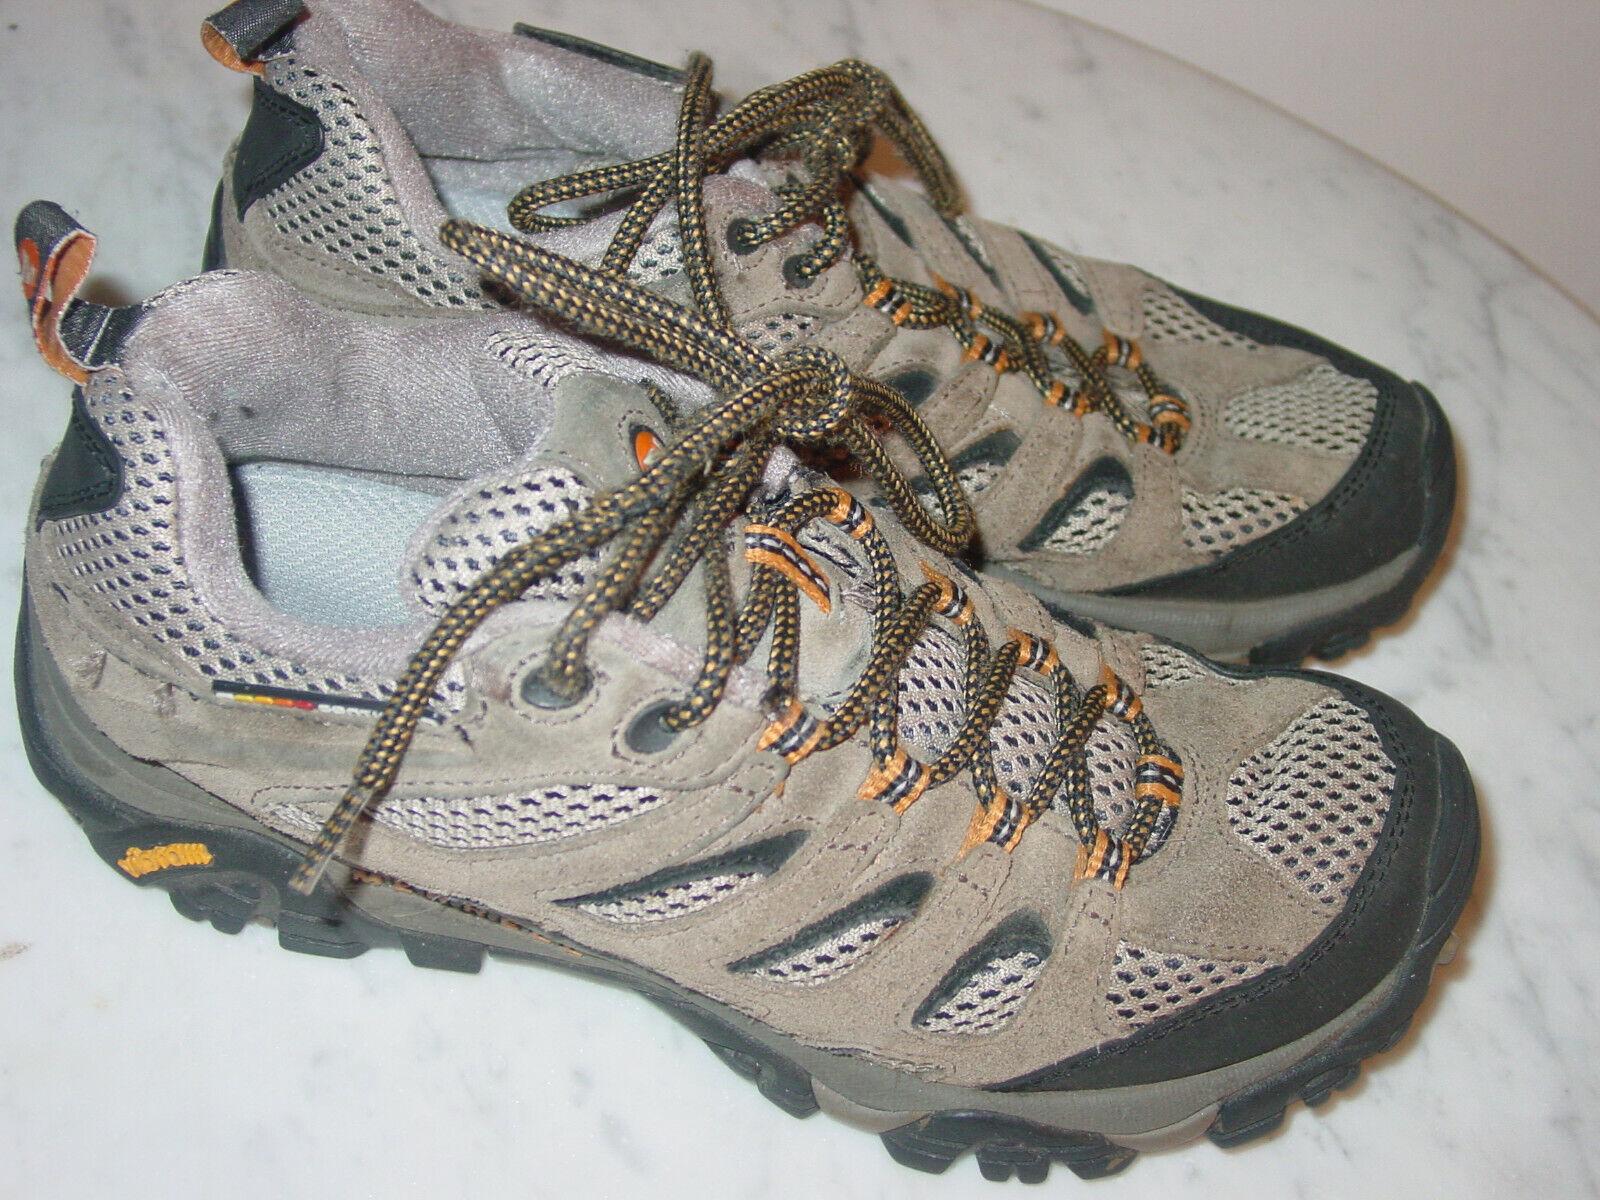 Merrell Moab Ventilator Nogal J86595 Trail Hiking tamaño del zapato 7